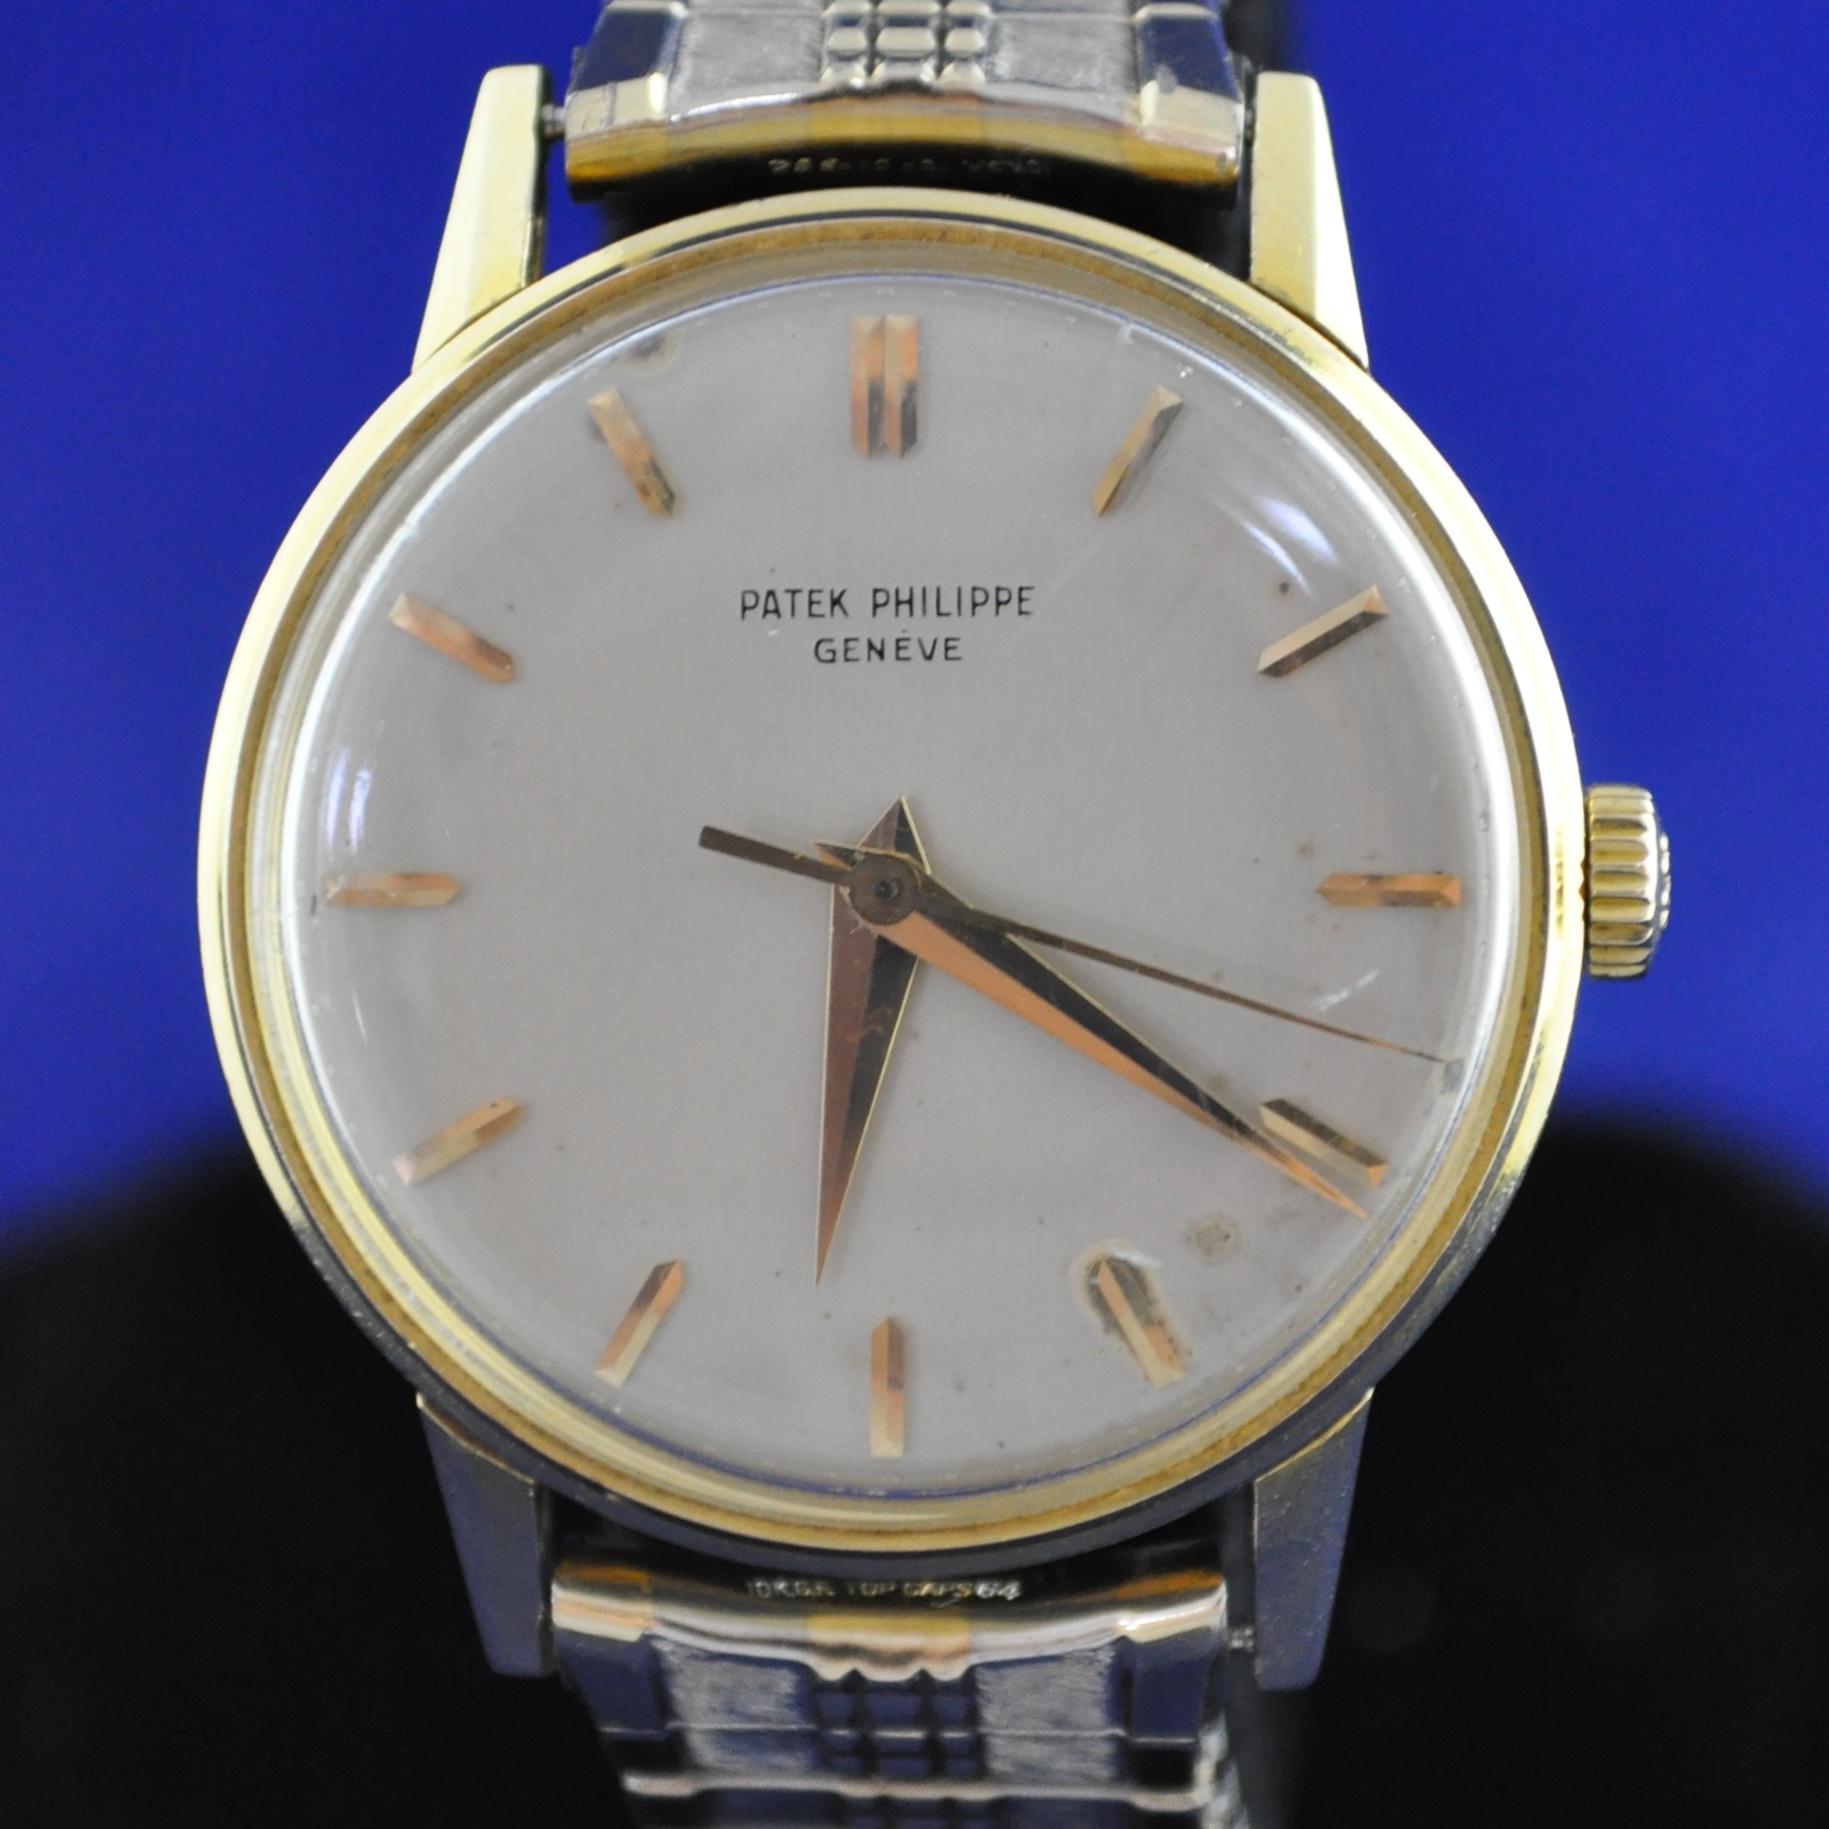 Patek Philippe Calatrava Wristwatch